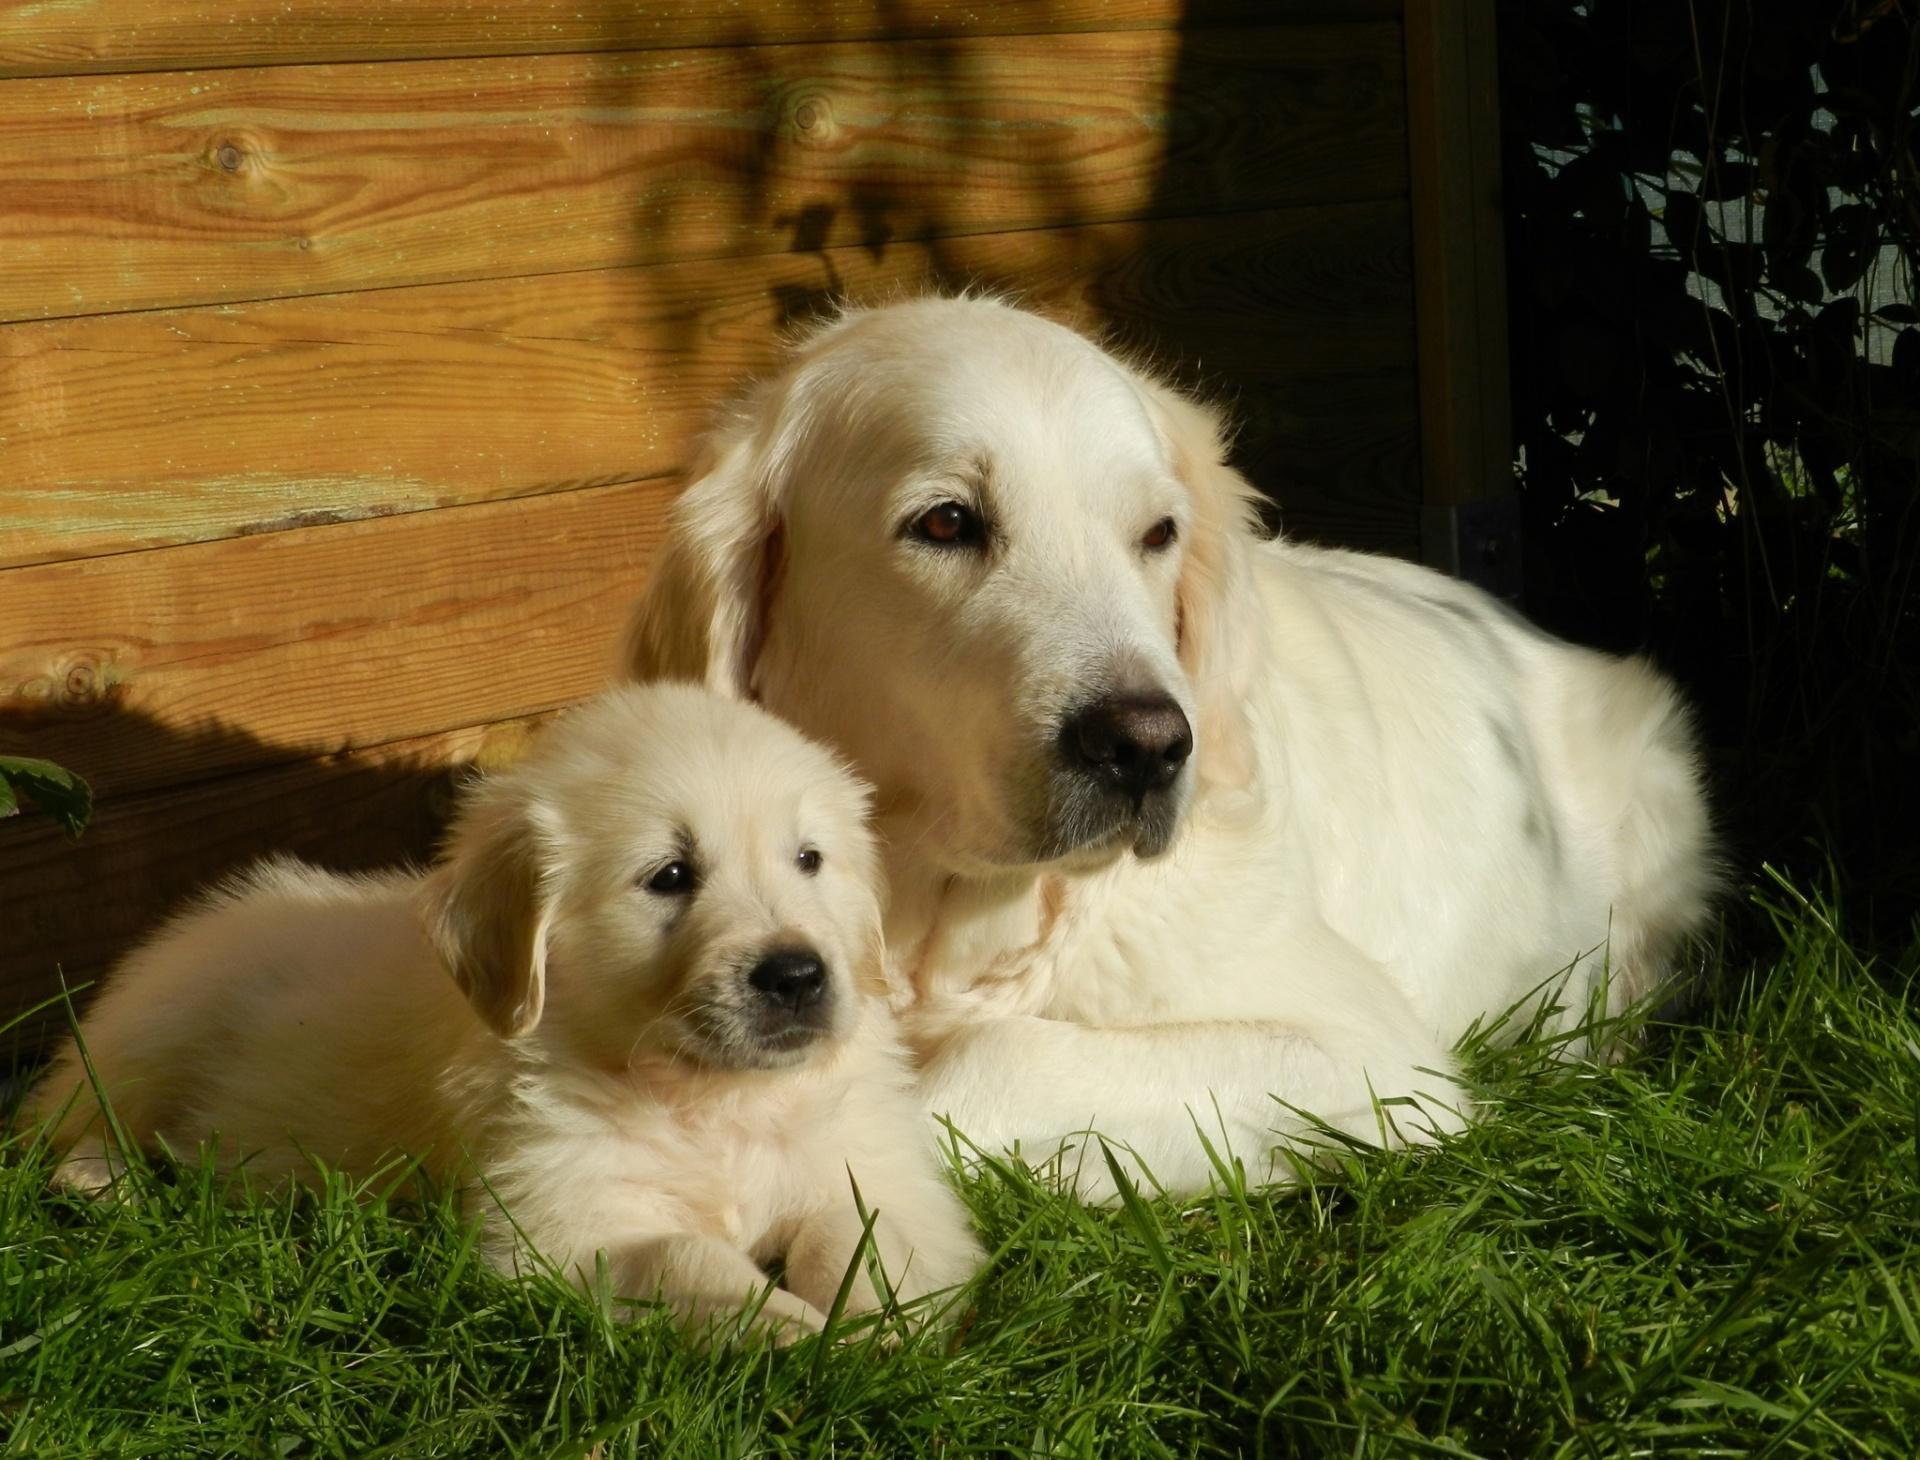 Dog Puppy Golden Retriever